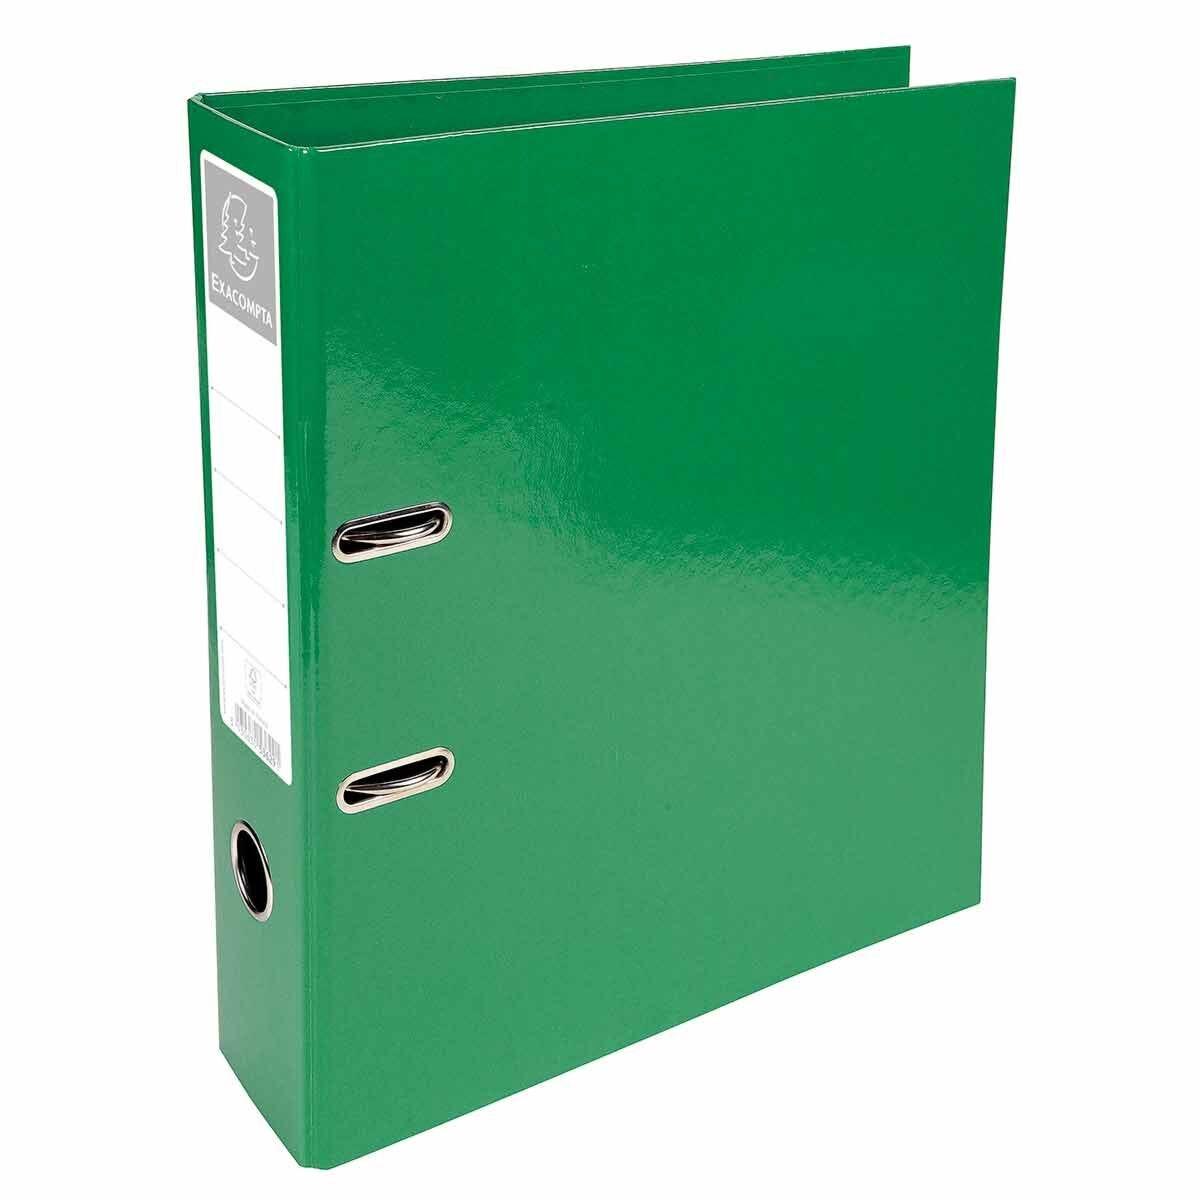 Exacompta Iderama PremTouch Lever Arch File A4 70mm Pack of 10 Dark Green